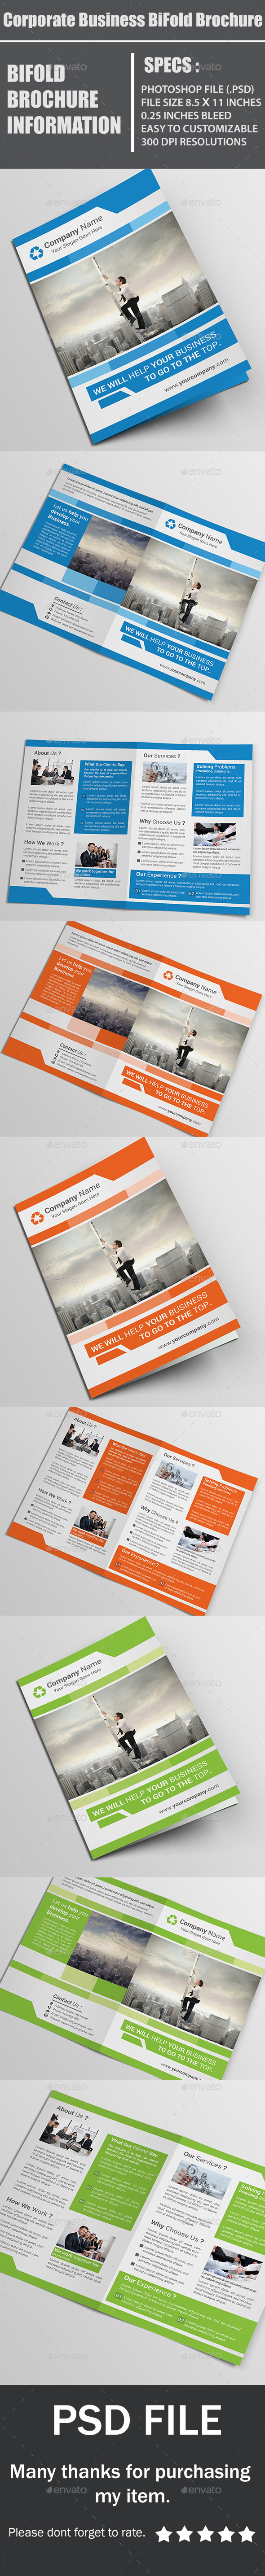 GraphicRiver Corporate Business BiFold Brochure 10833650